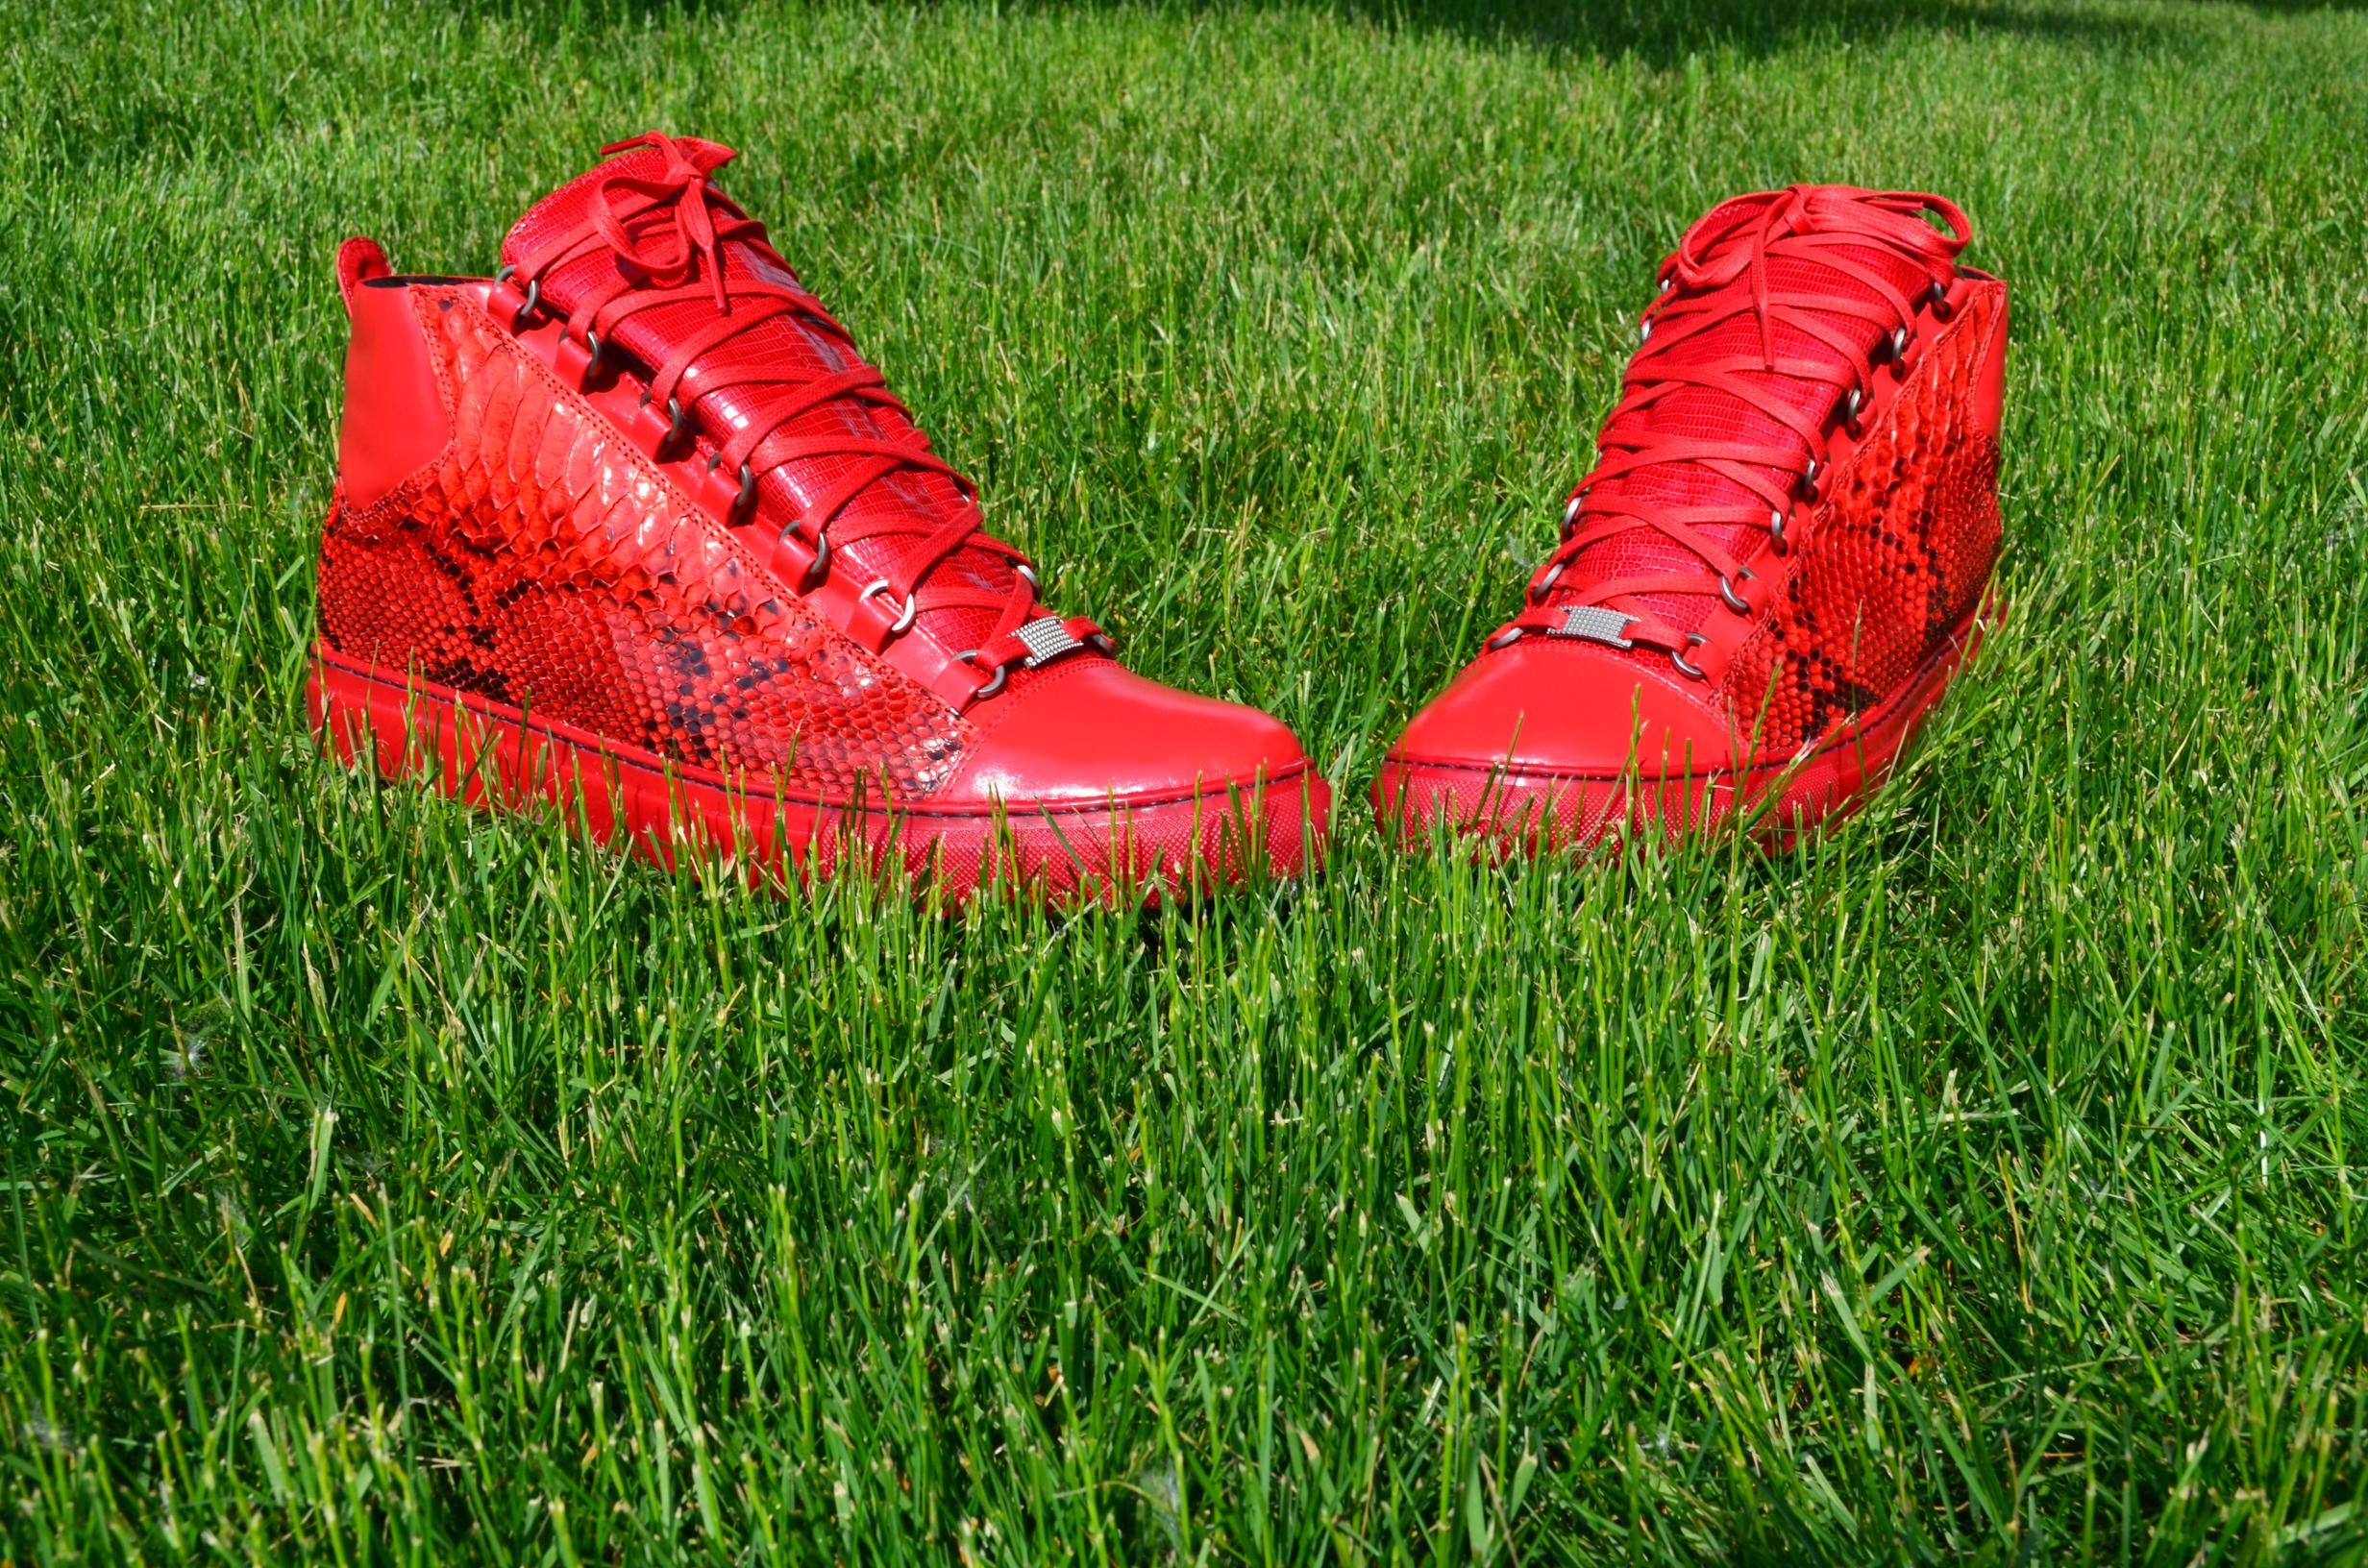 lebron-james-2013-nba-finals-game-4-pmk-custom-balenciaga-sneakers-fashion-style